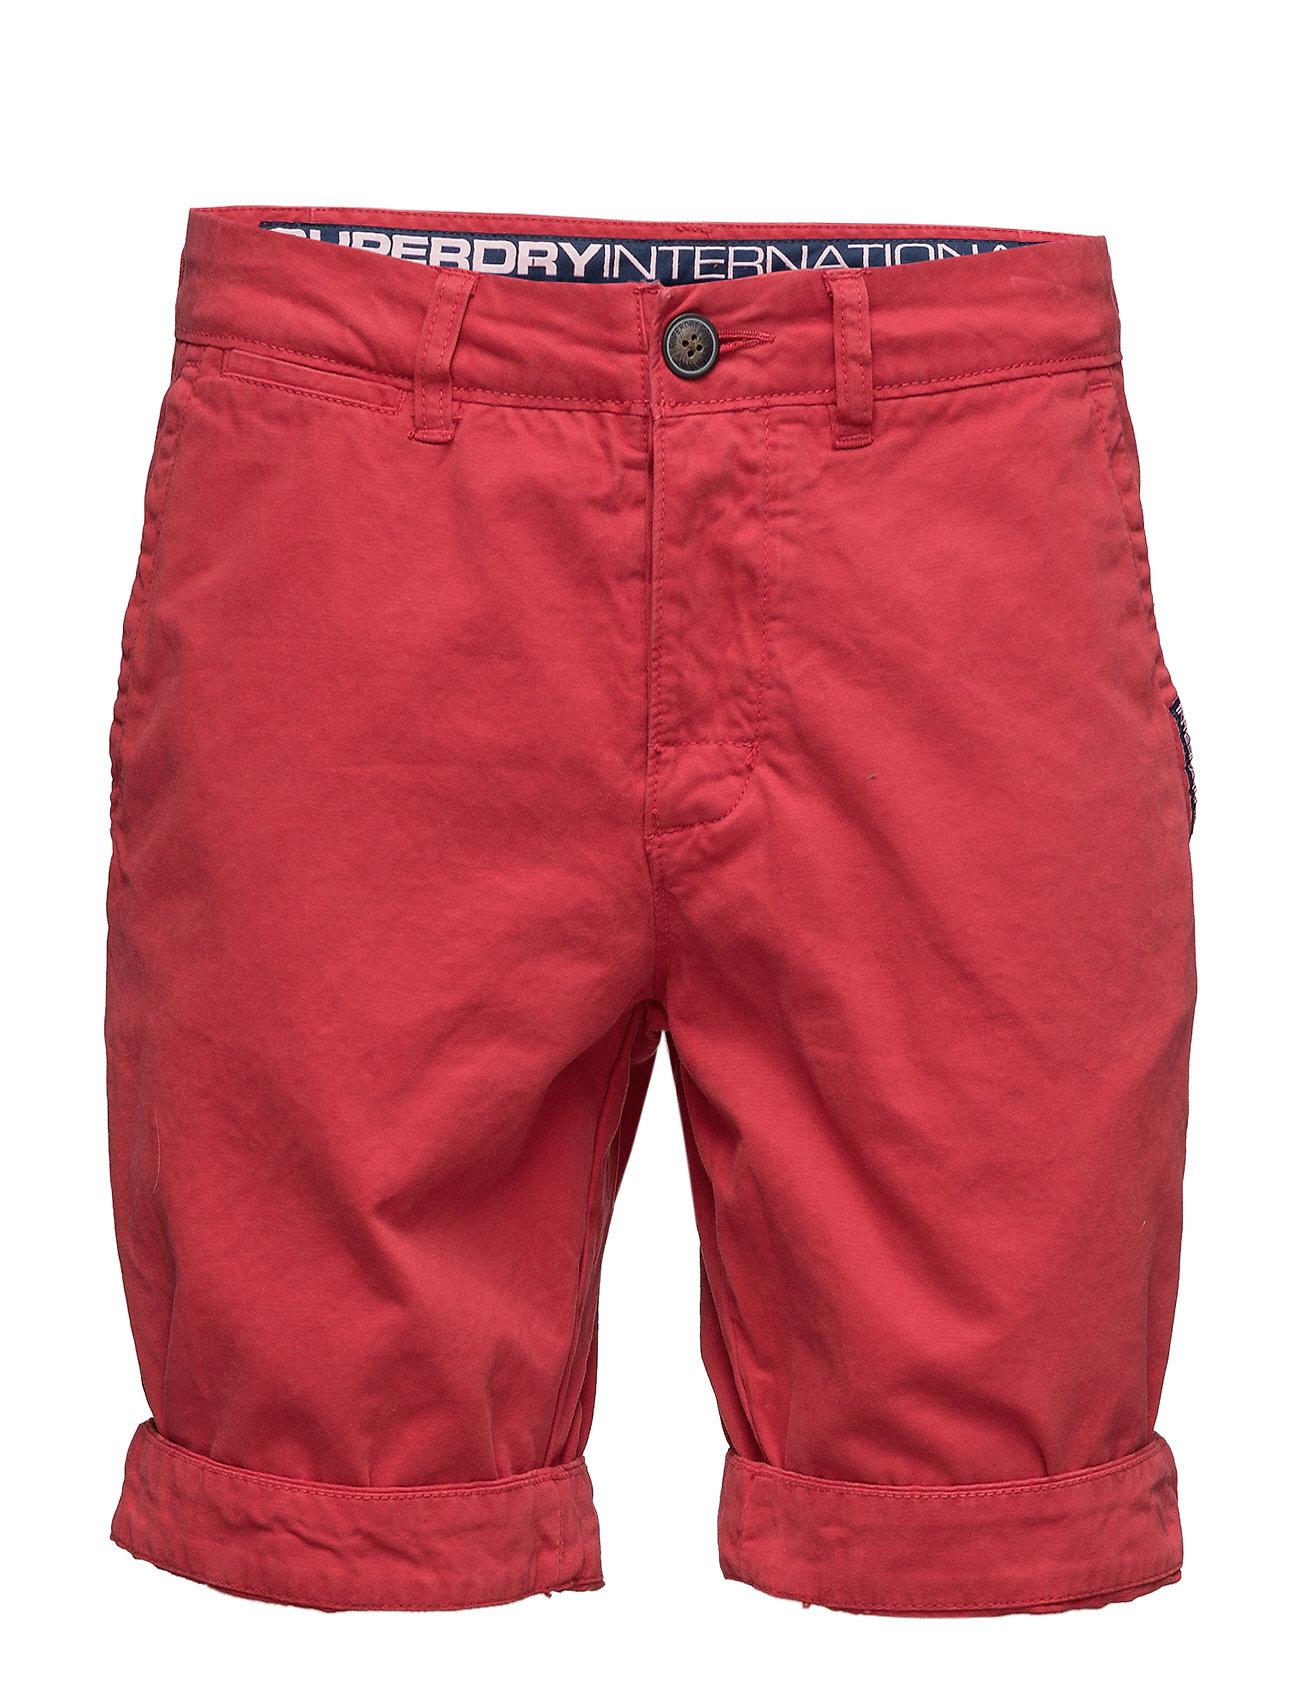 International Chino Short Superdry Bermuda shorts til Herrer i